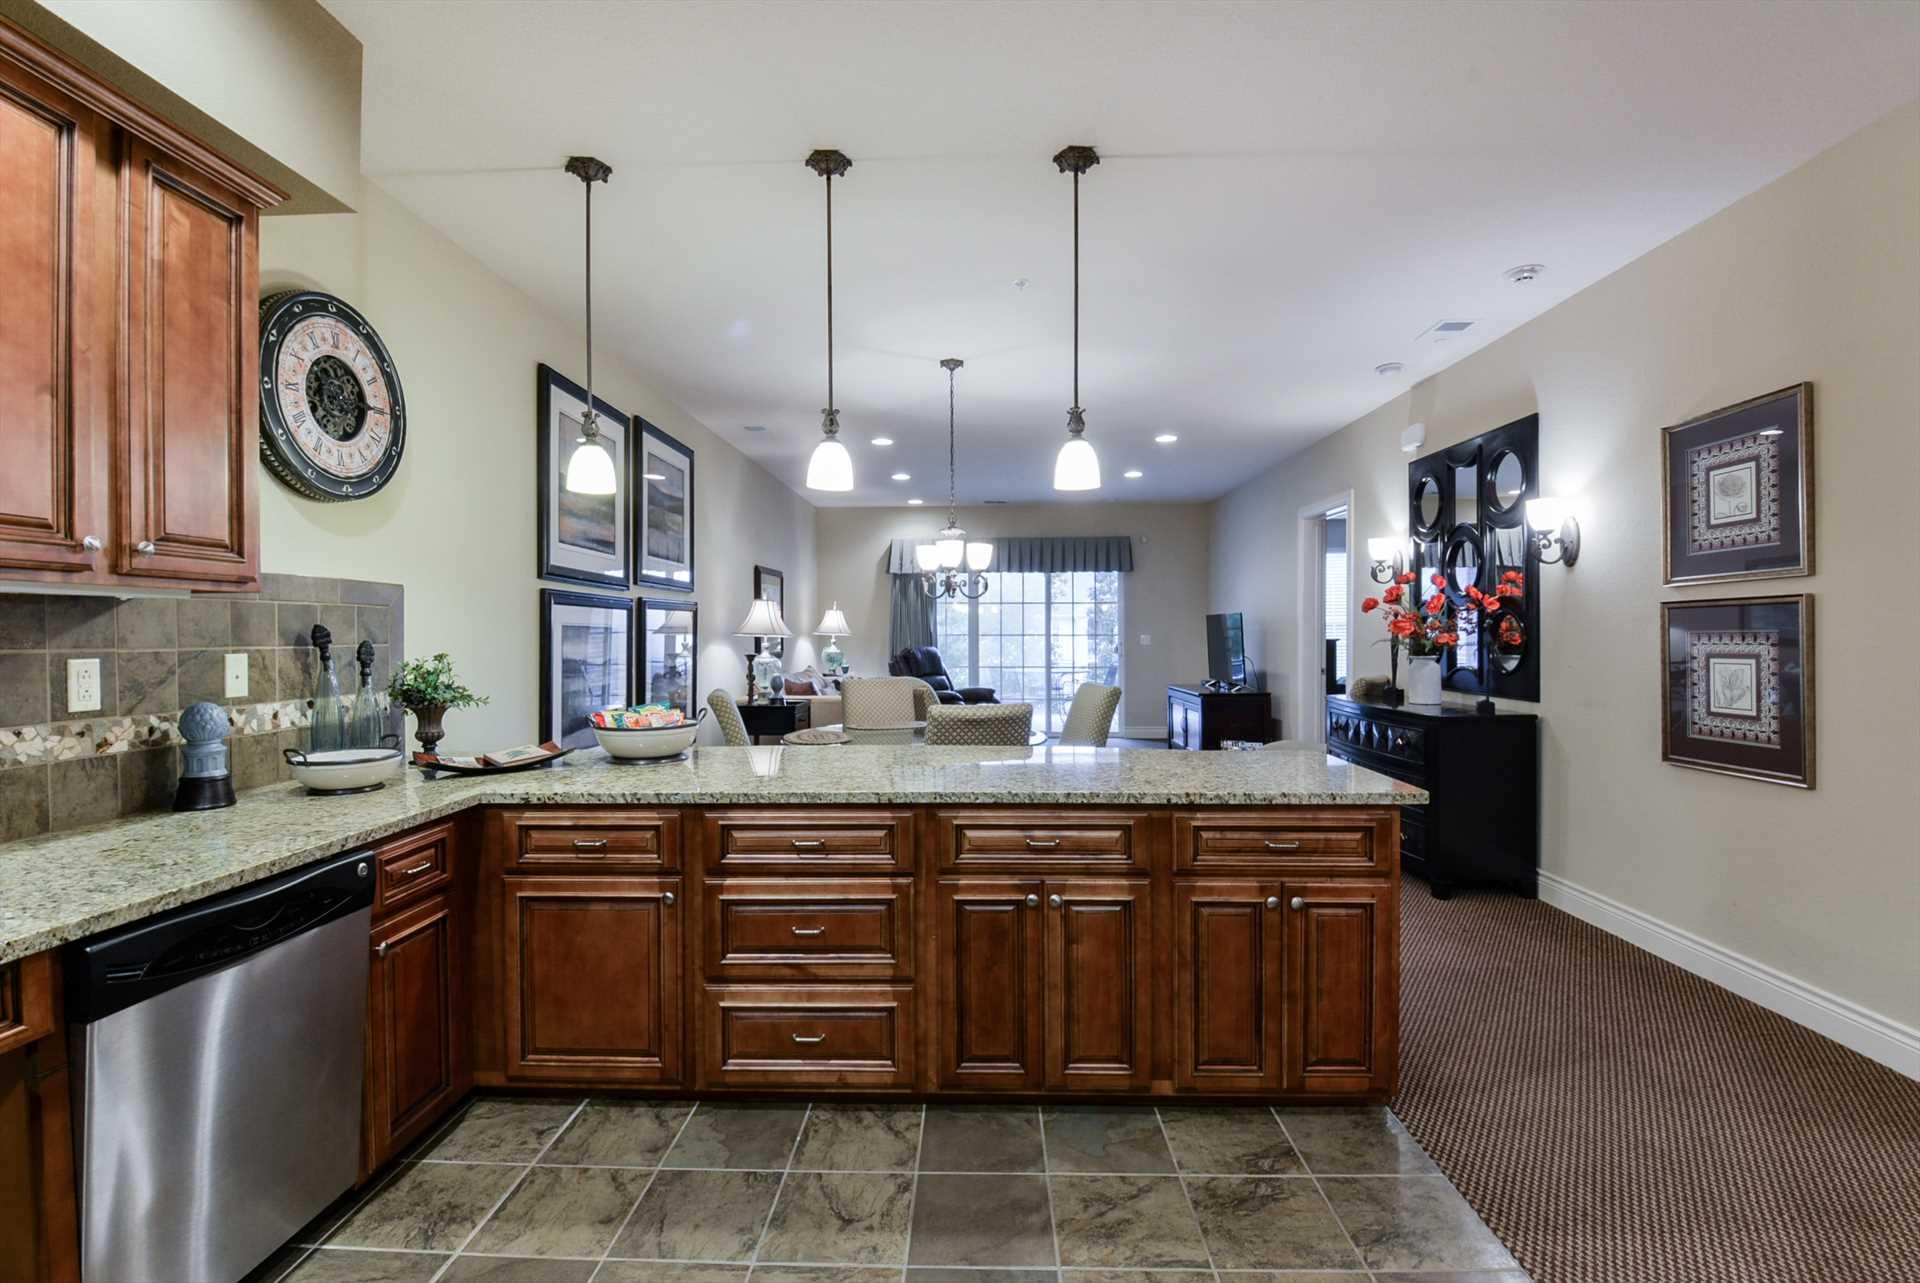 The kitchen overlooks the living area.